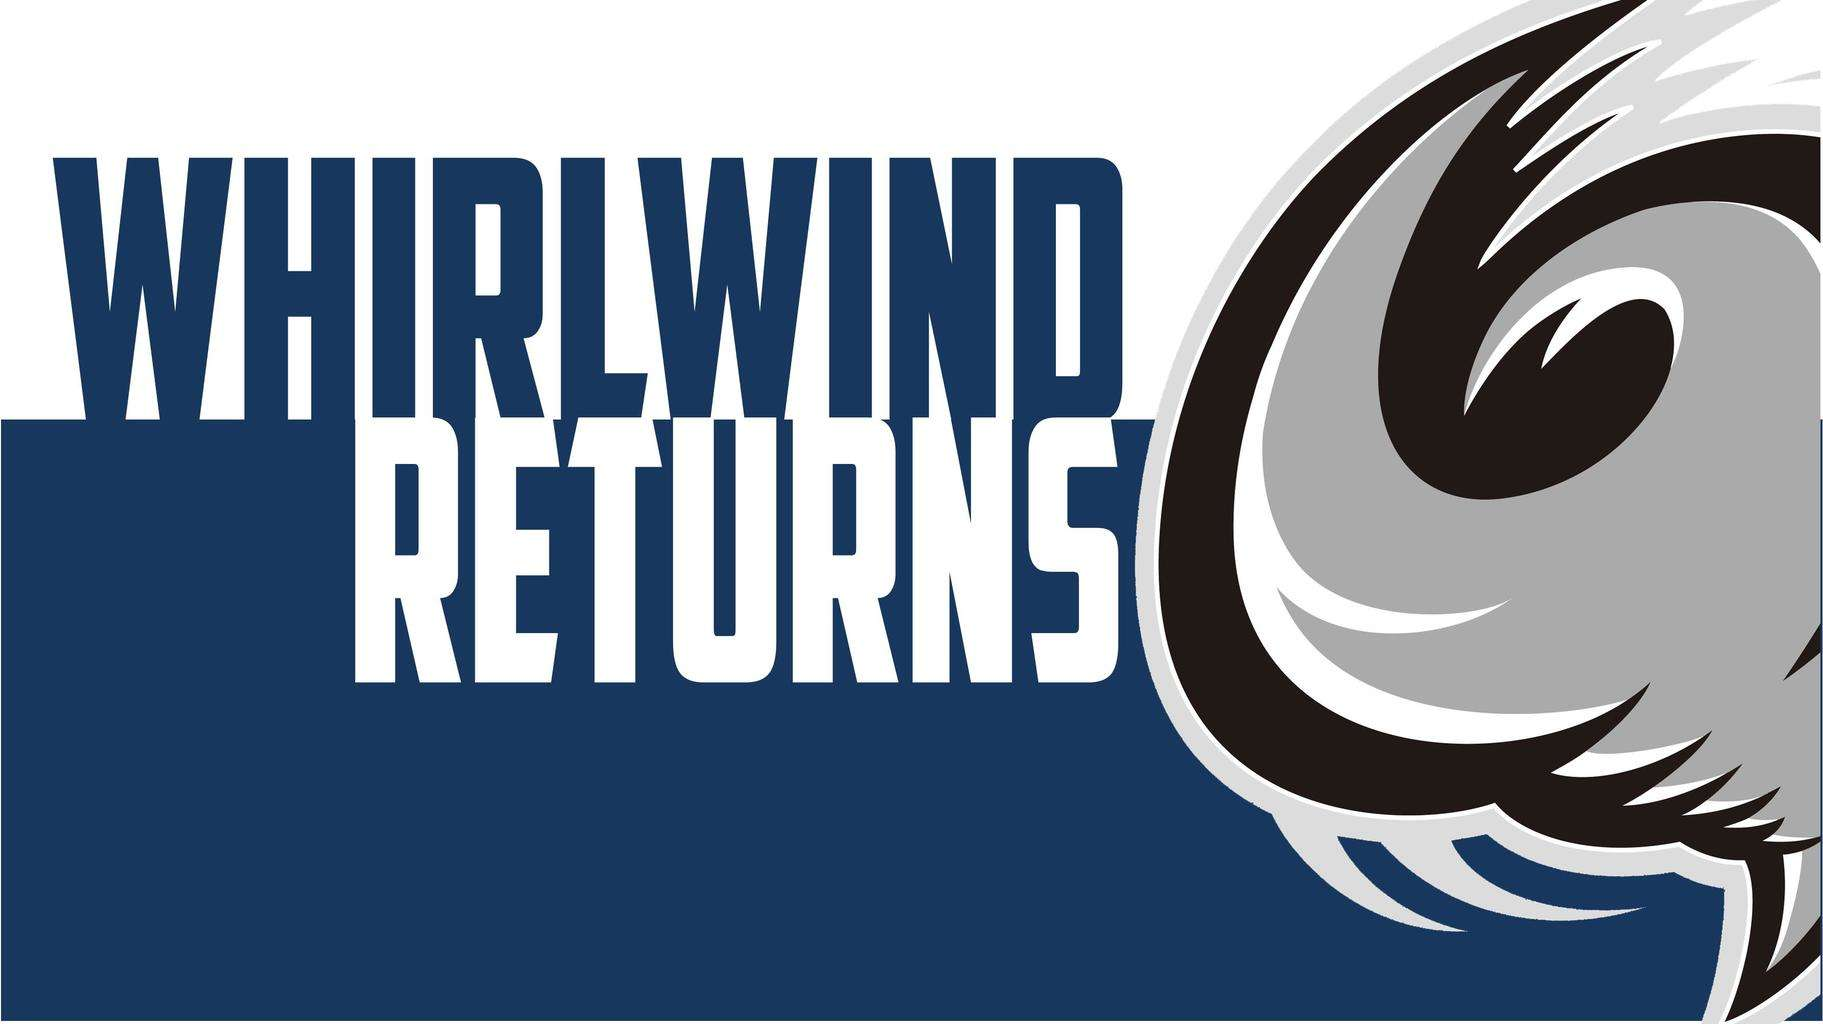 Whirlwind Returns